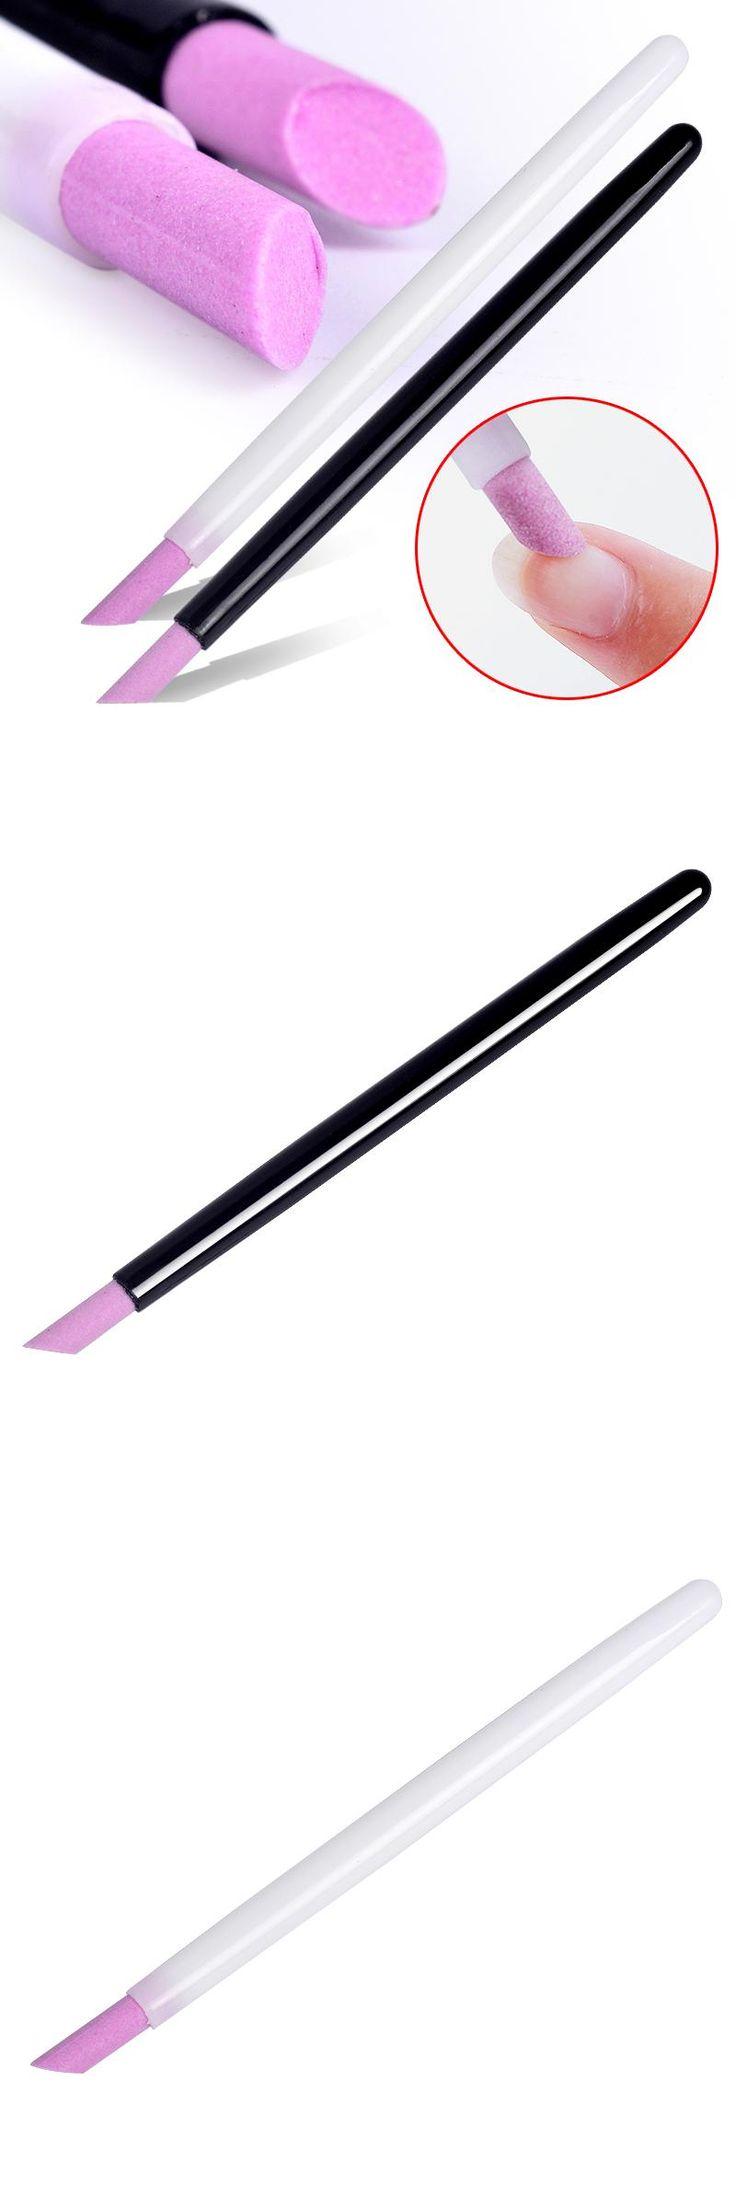 [Visit to Buy] 2017 New Style hot selling  black & white Scrub pen Quartz Manicure Pen Nail Art Carving Pen Brushes Acrylic Handle Salon Tool   #Advertisement